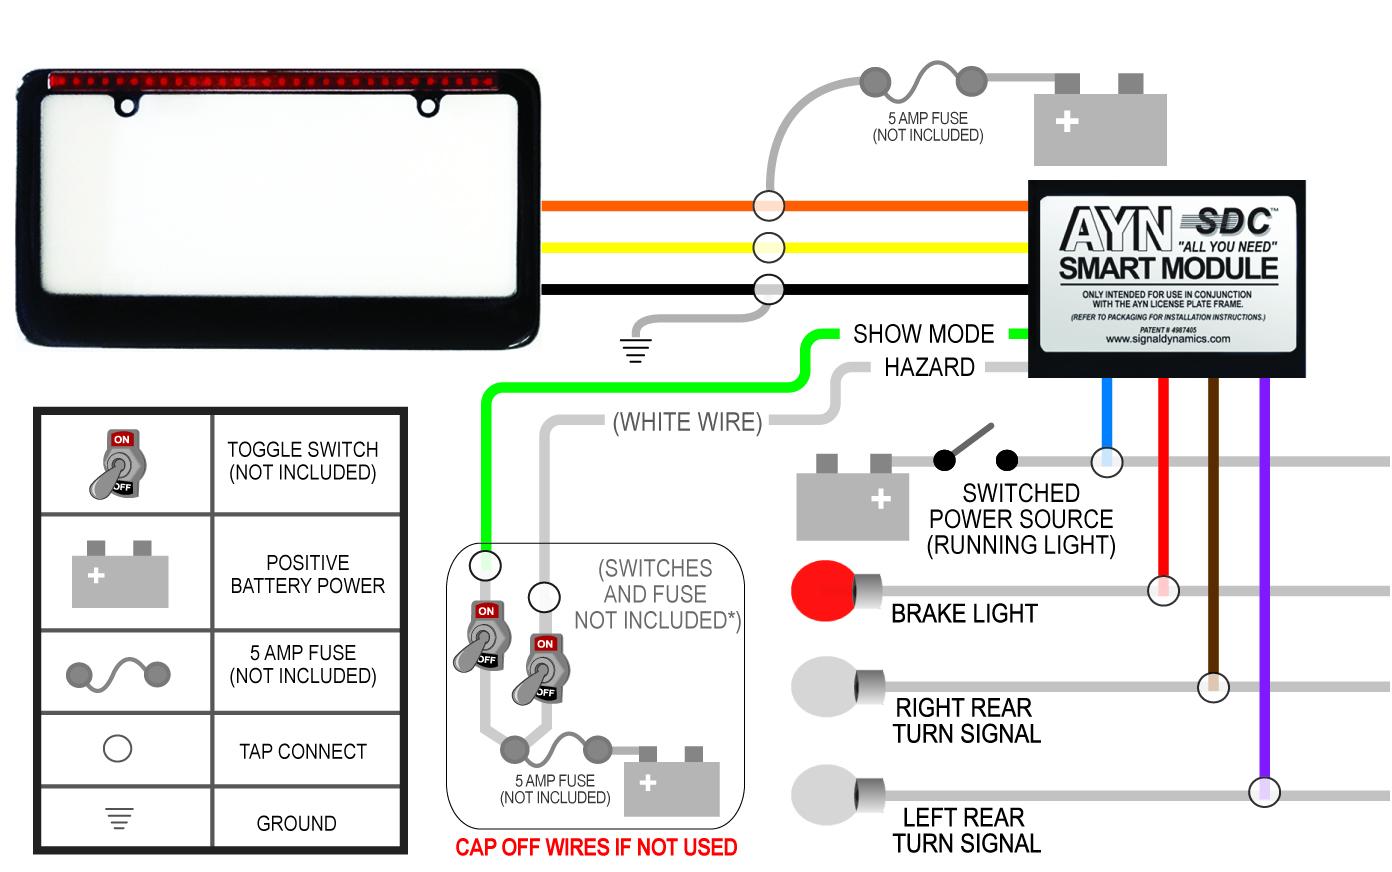 black auto wiring diagram?t=1399476781 black ayn automotive license plate frame & smart module combo Basic Turn Signal Wiring Diagram at beritabola.co